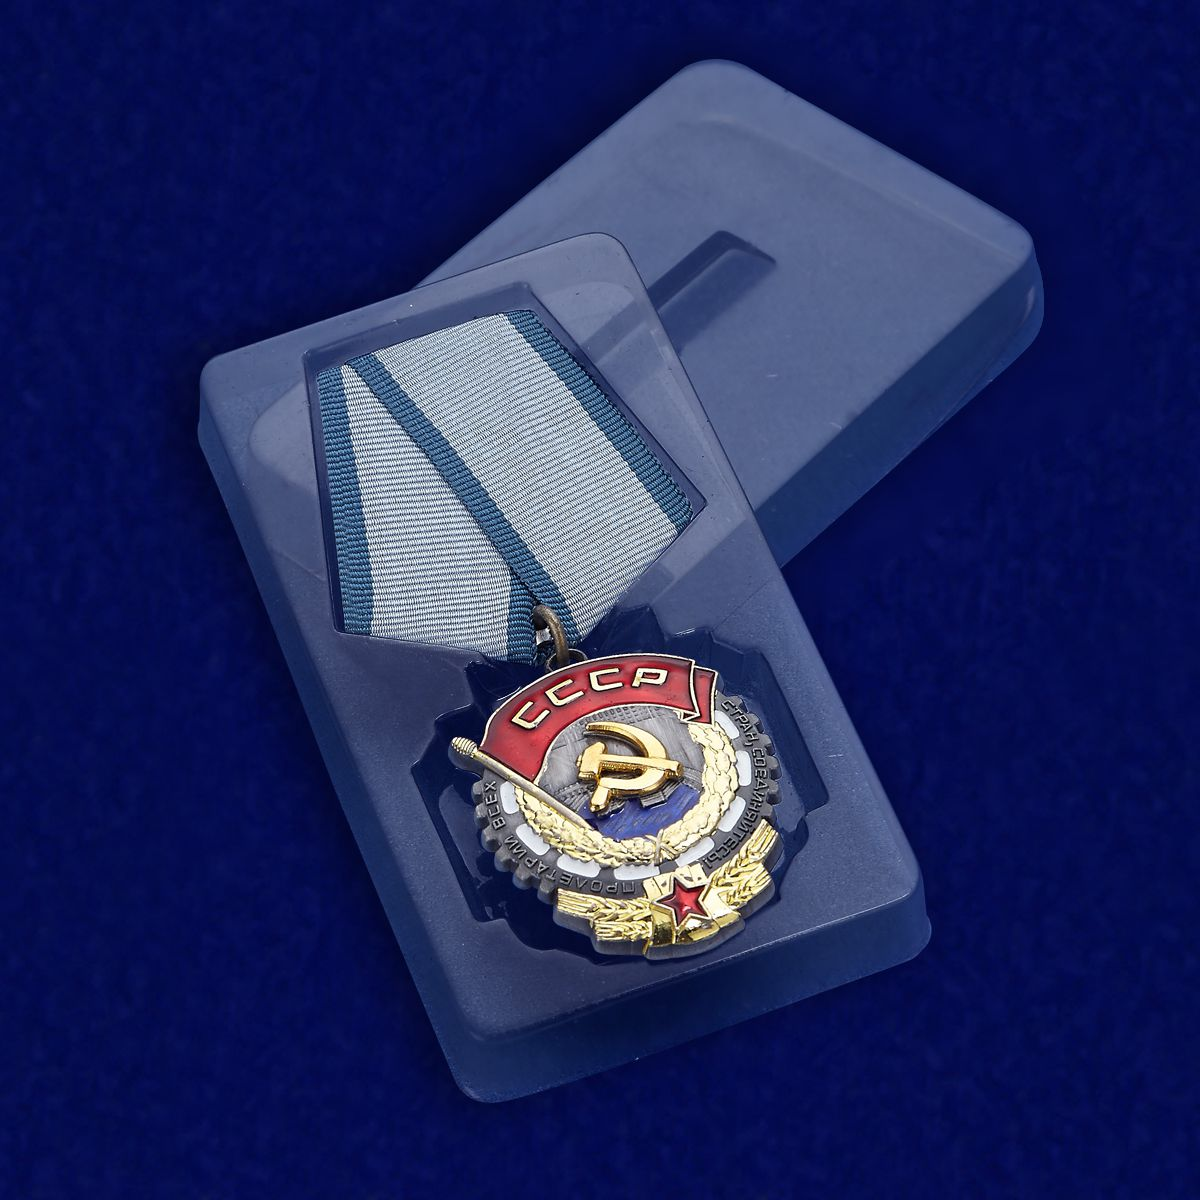 Орден Трудового Красного знамени СССР в футляре из пластика